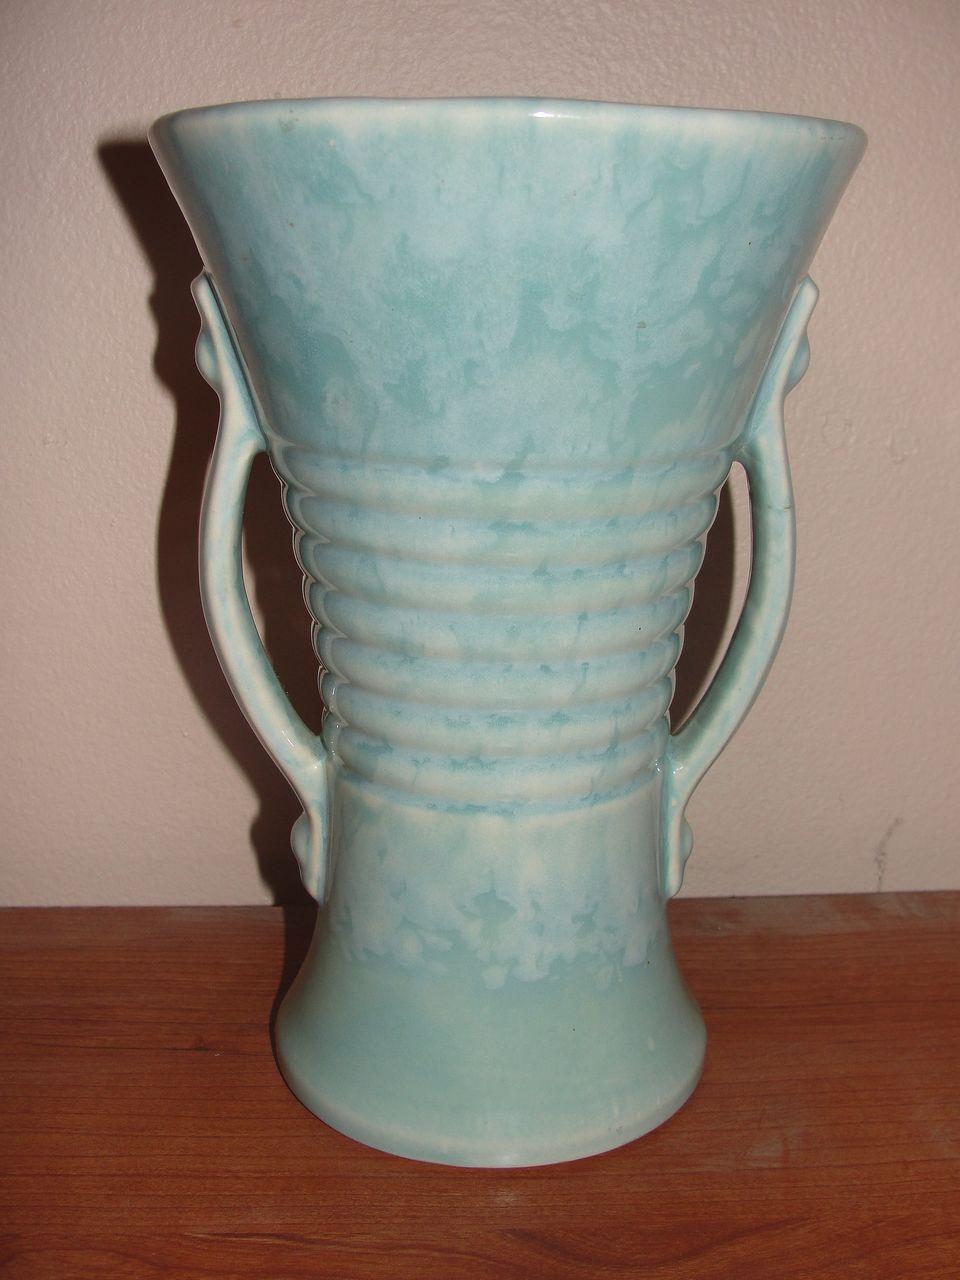 Brush Aqua Double Handle Vase - b22